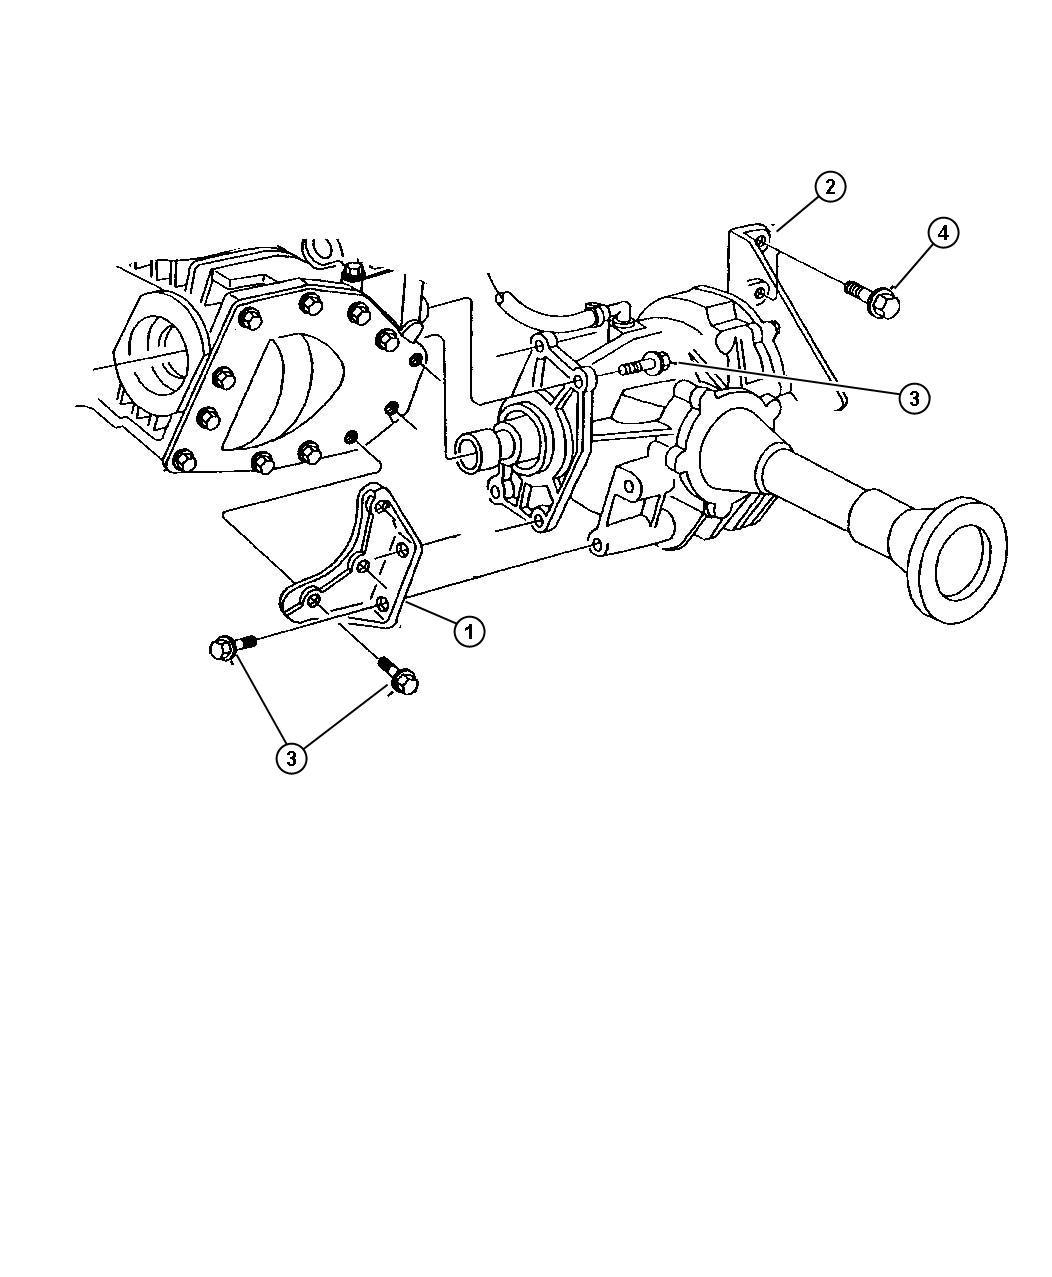 Dodge Grand Caravan Engine Mounts Power Transfer Unit Awd